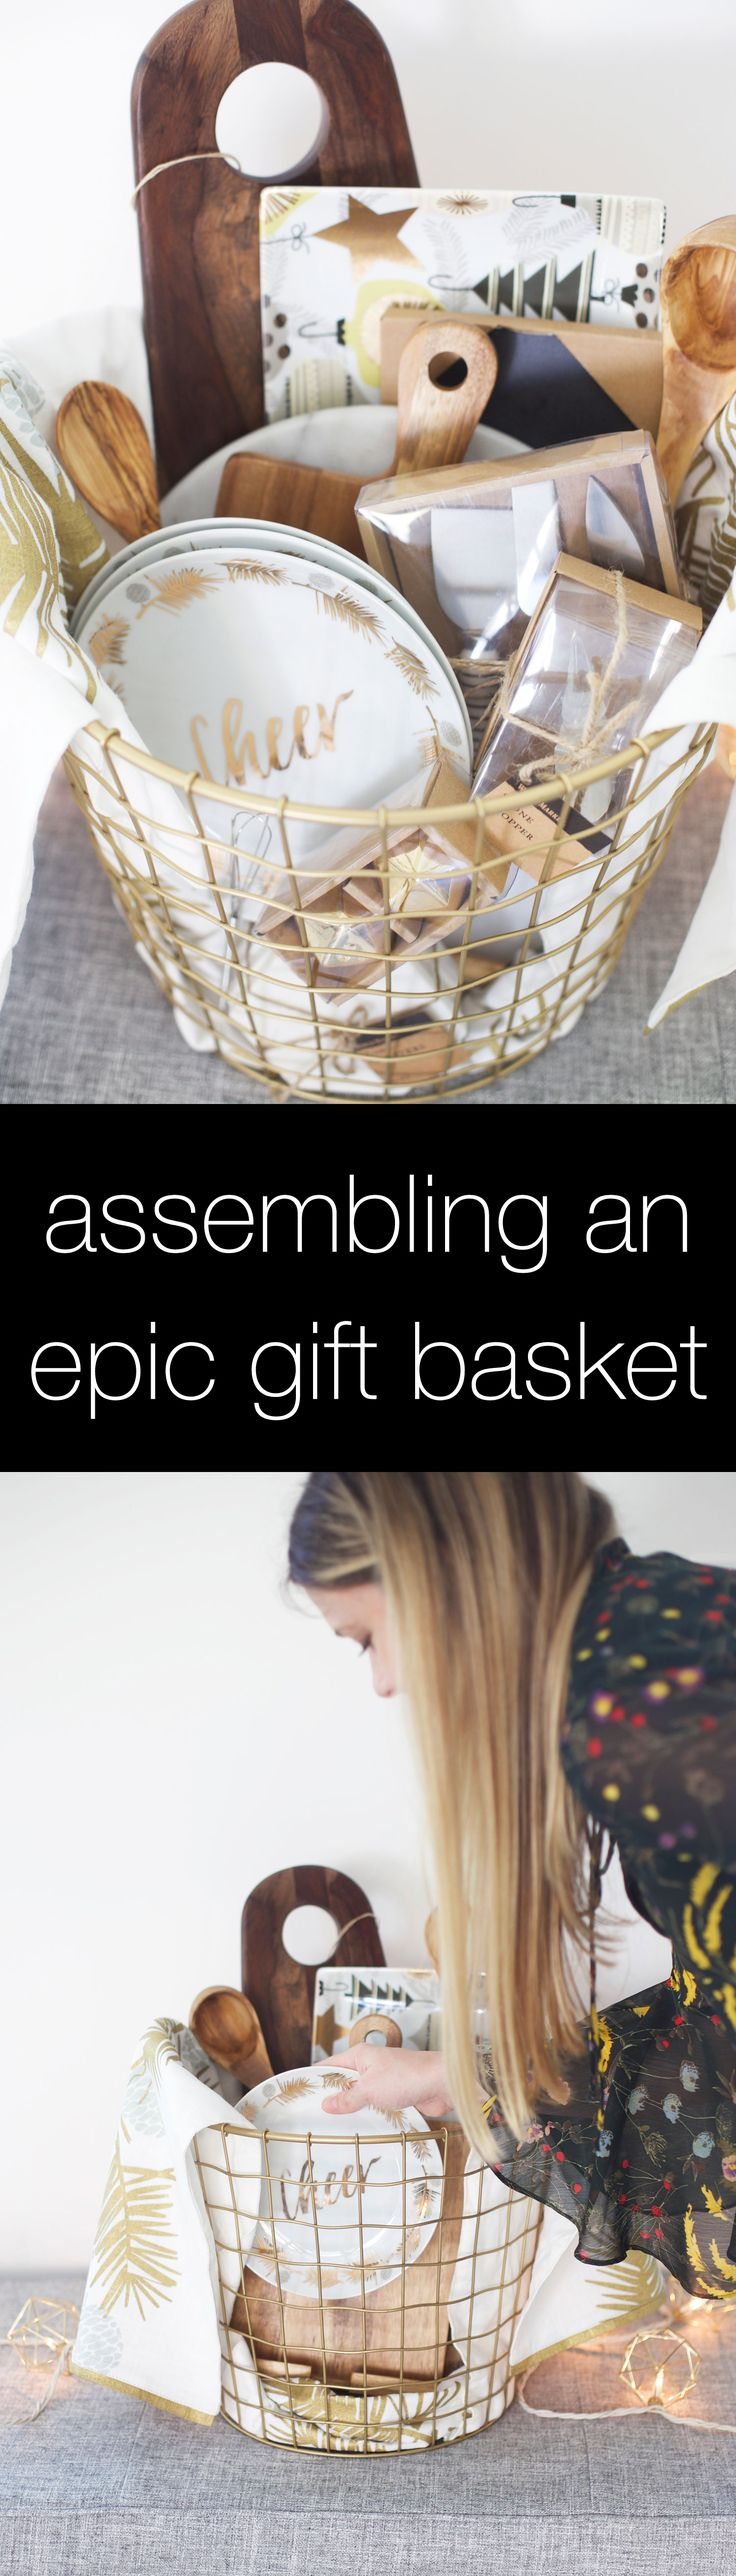 Gift Basket Wrapping Ideas Best 25 Wedding Gift Baskets Ideas On Pinterest Bachelorette